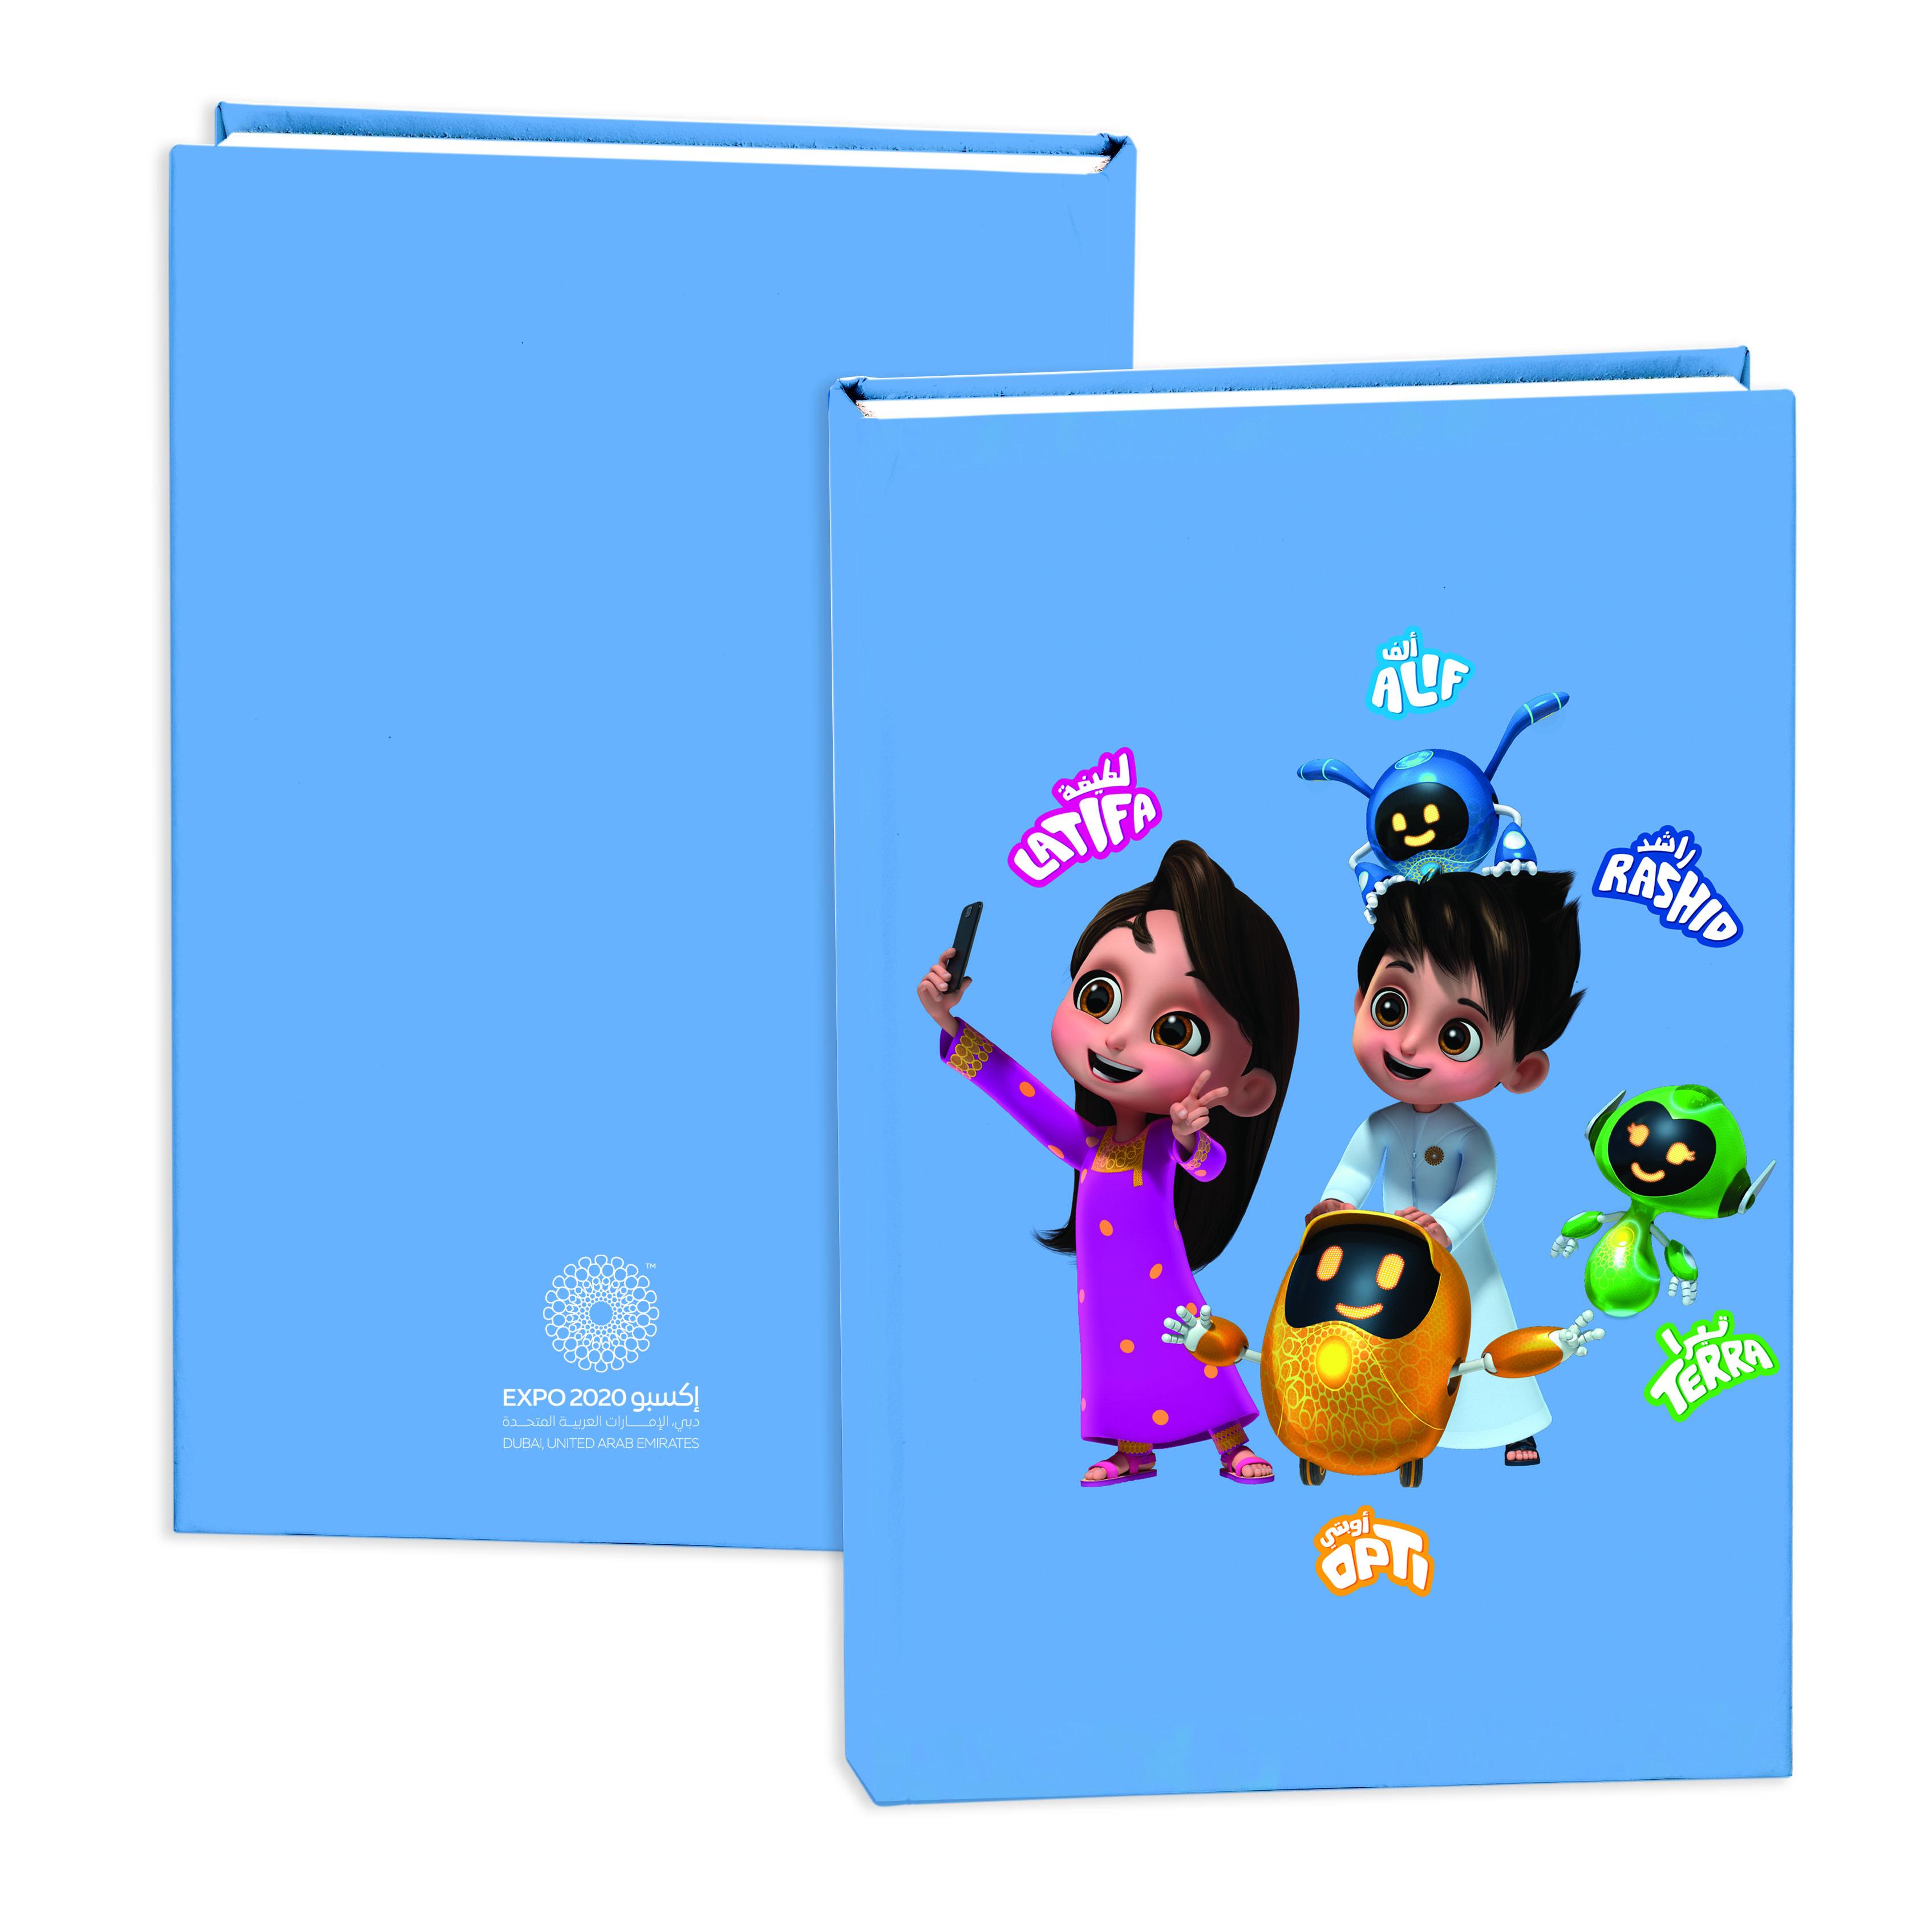 Expo 2020 Dubai Mascots A5 Hardcase Exercise Books Pack of 2 - 192 Pages - Latifa